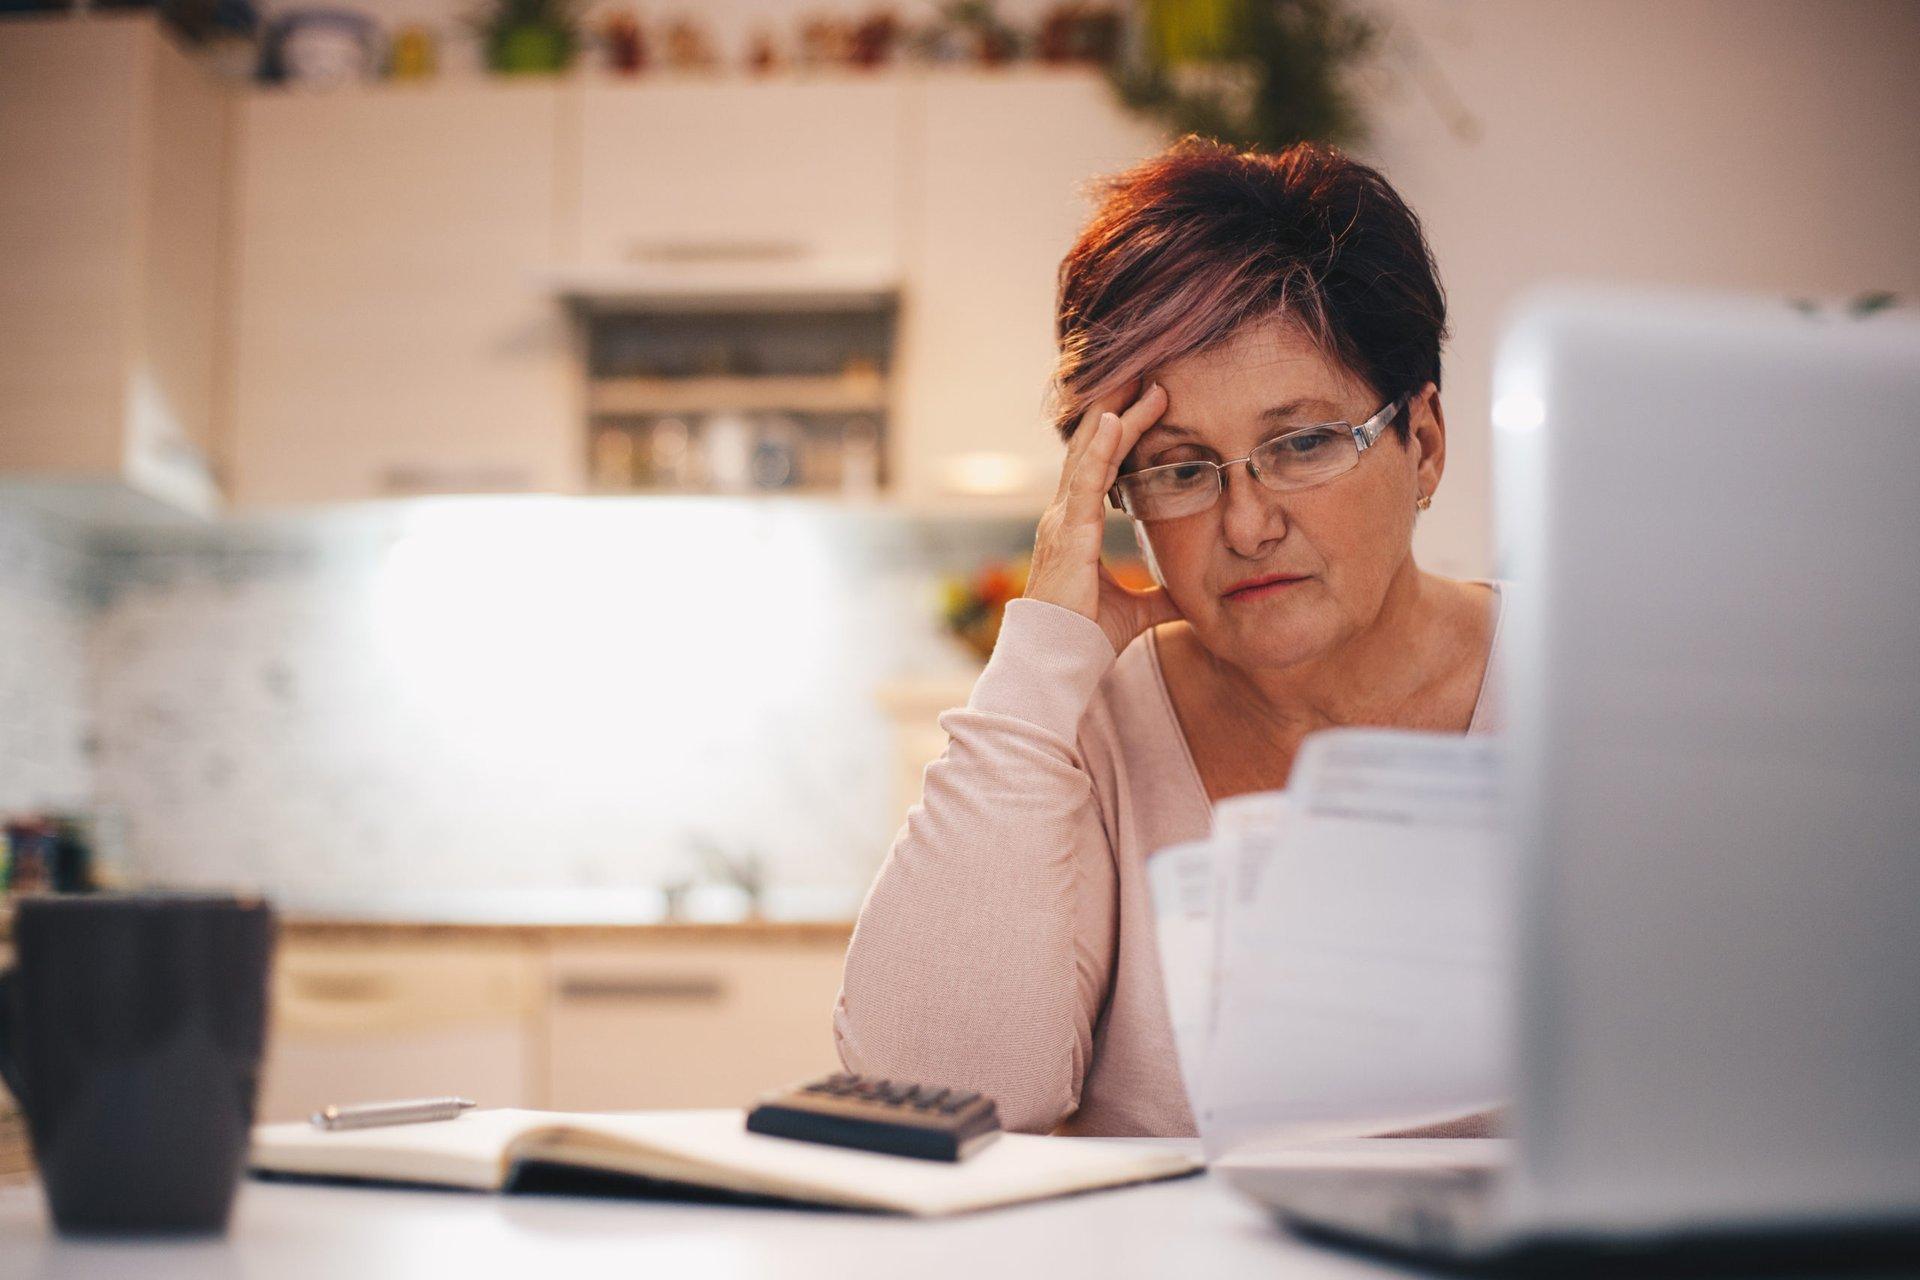 retiree worried about finances